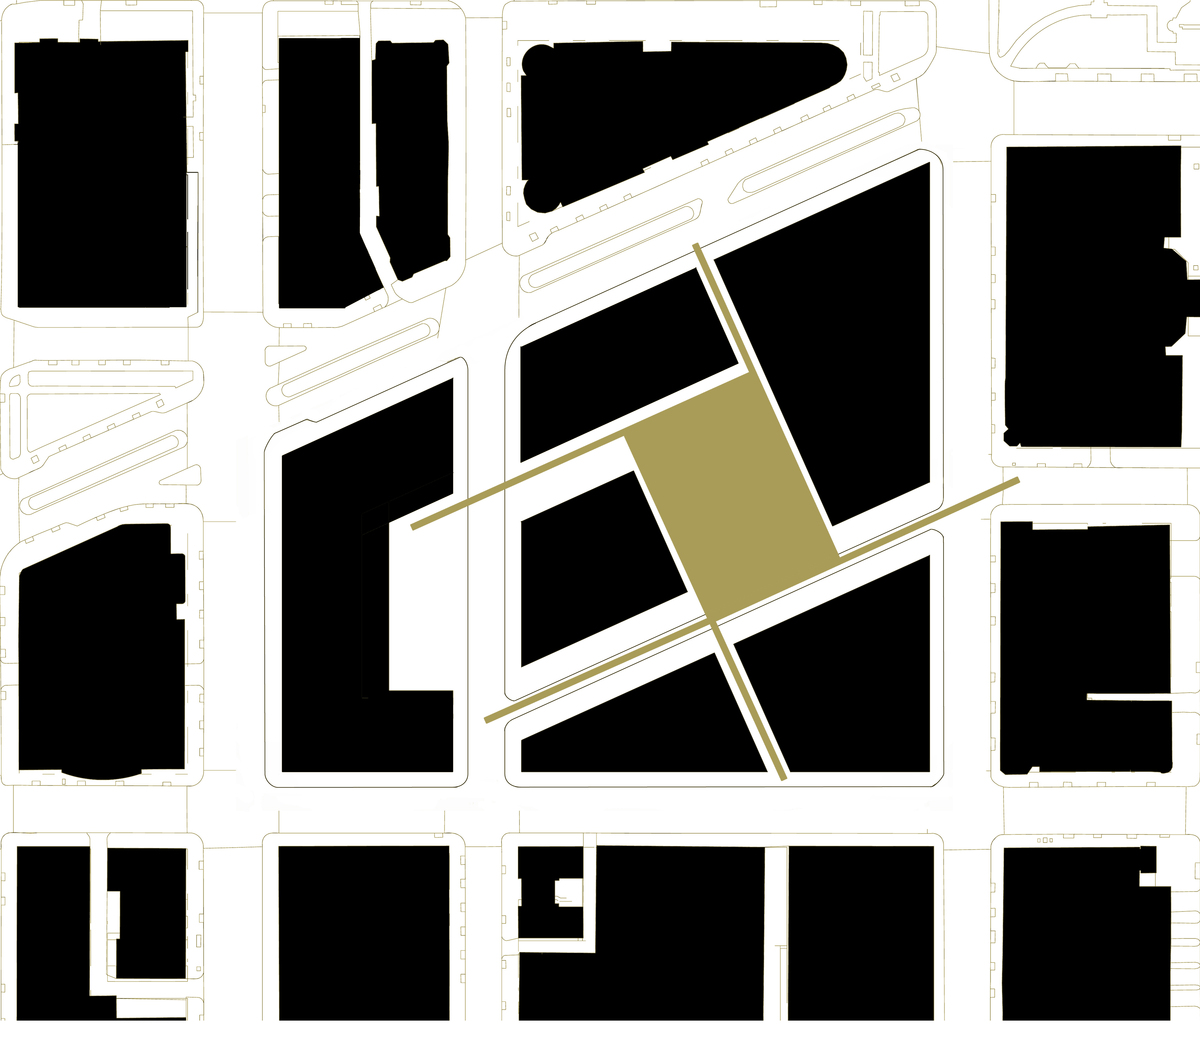 Plaza Organization Diagram